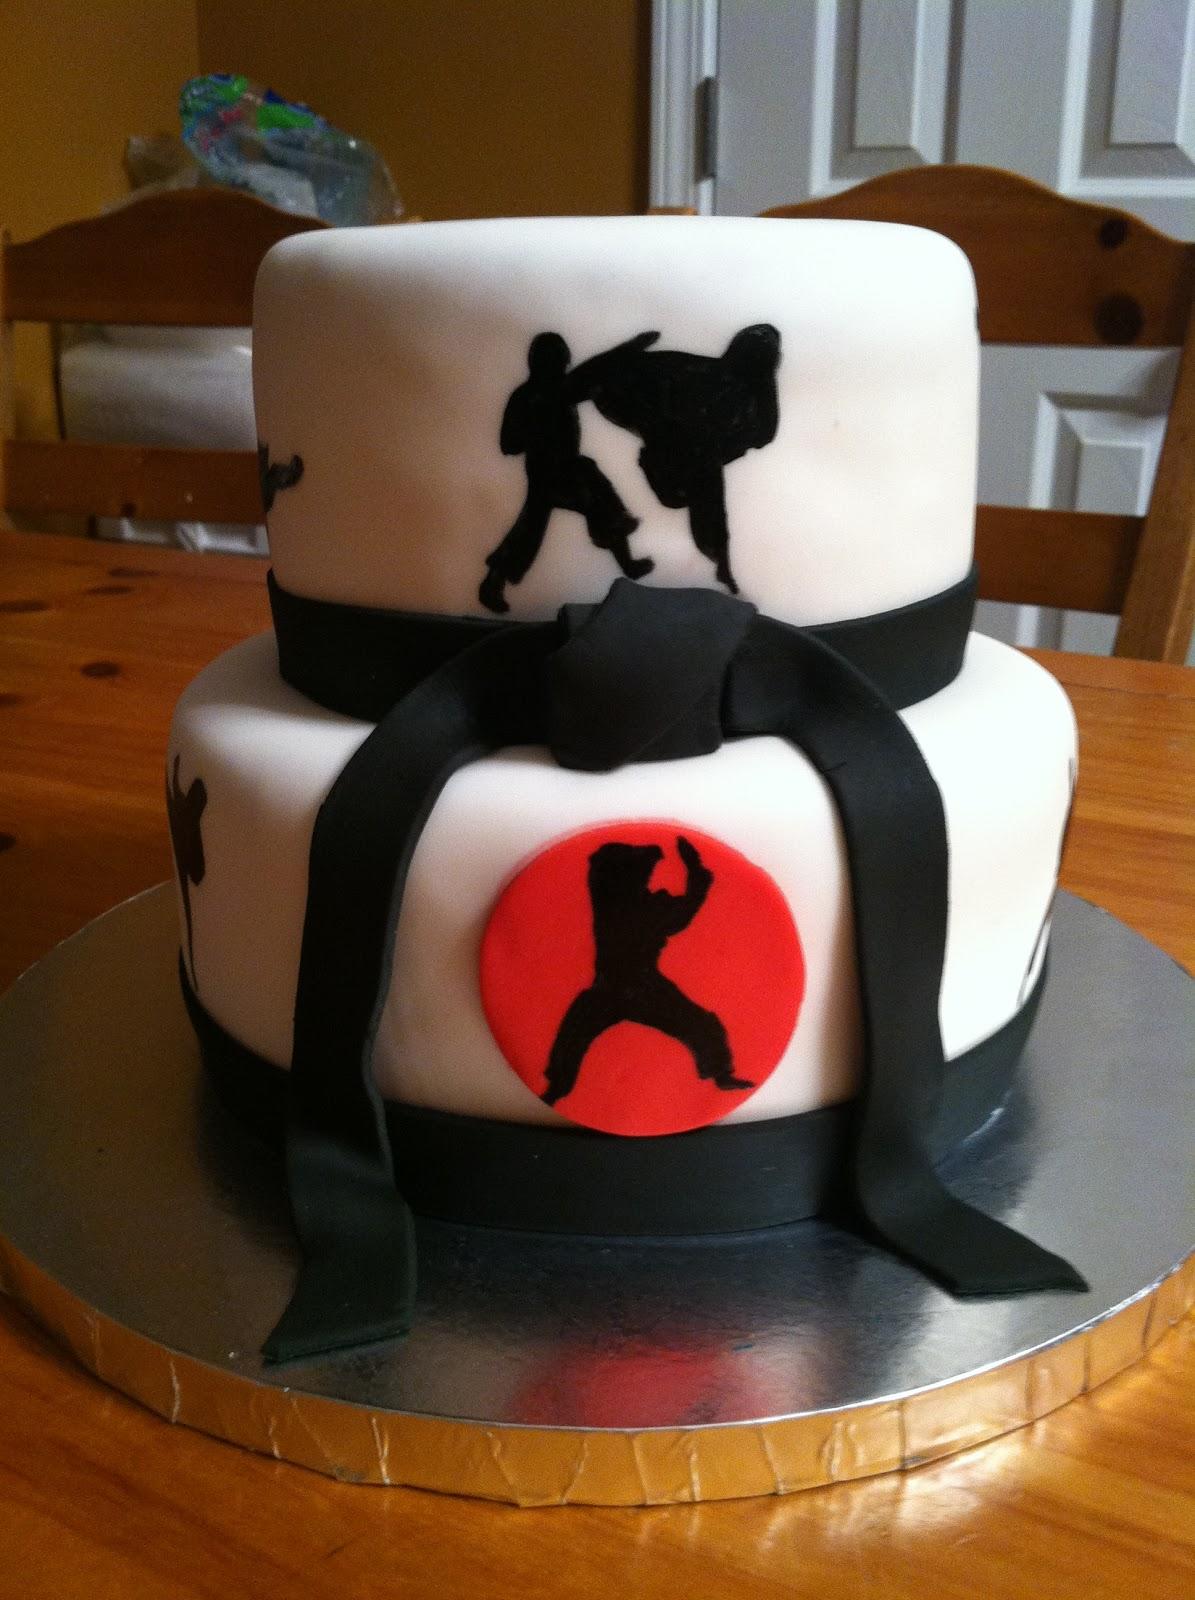 Cake Design Karate : Karate Kid Birthday Cake ~ Image Inspiration of Cake and ...